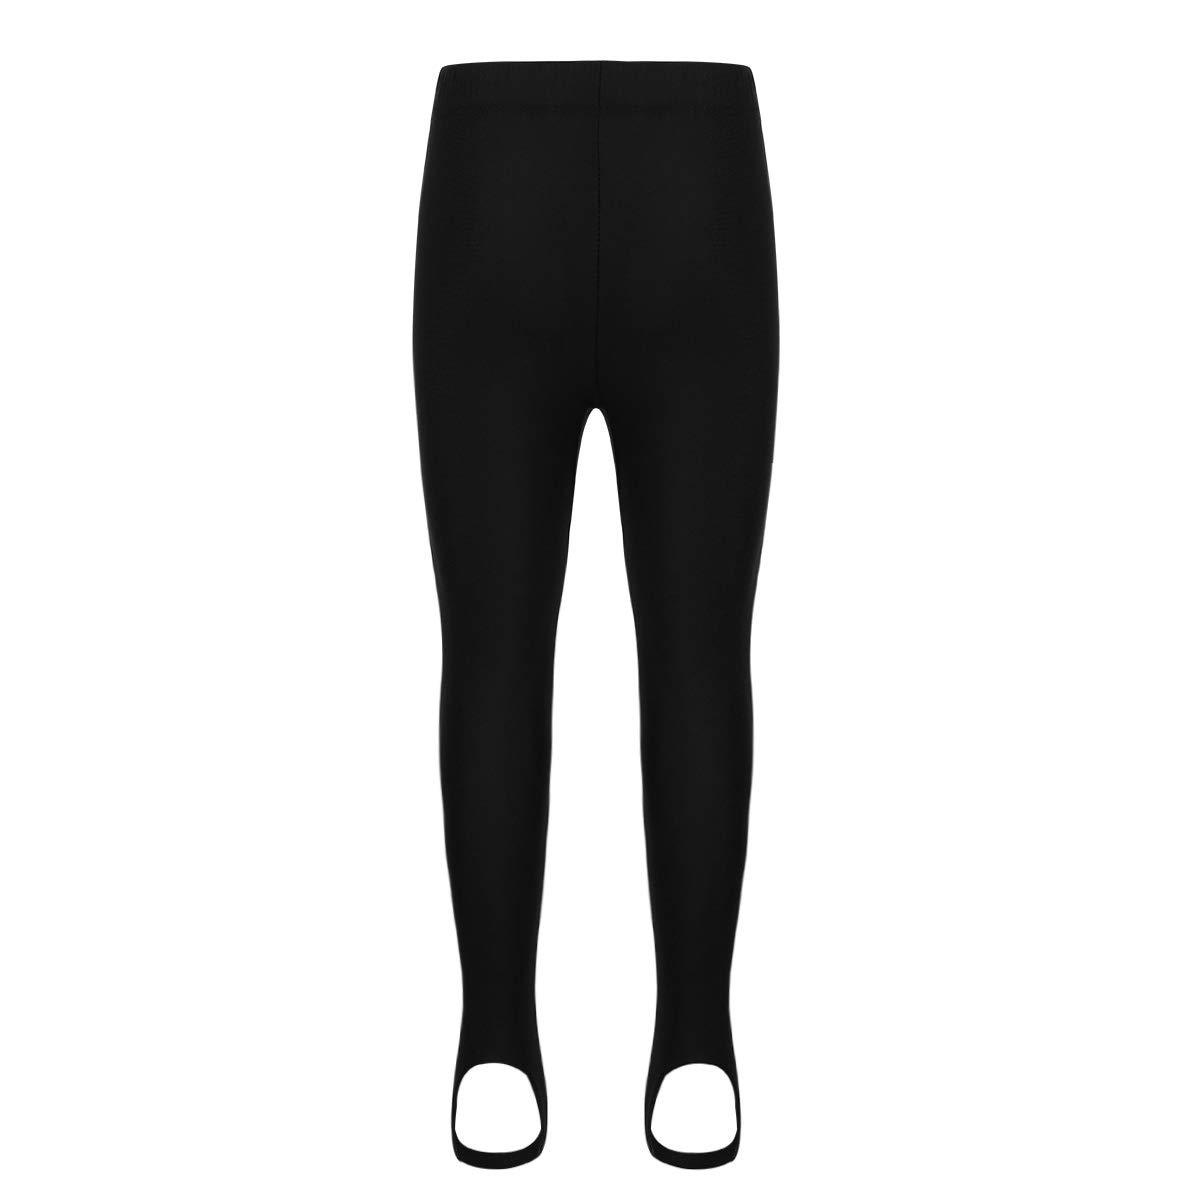 zdhoor Kids Toddler Boys Girls Ballet Dance Stirrup Tights Yoga Practice Leggings Gymnastics Foot Pants